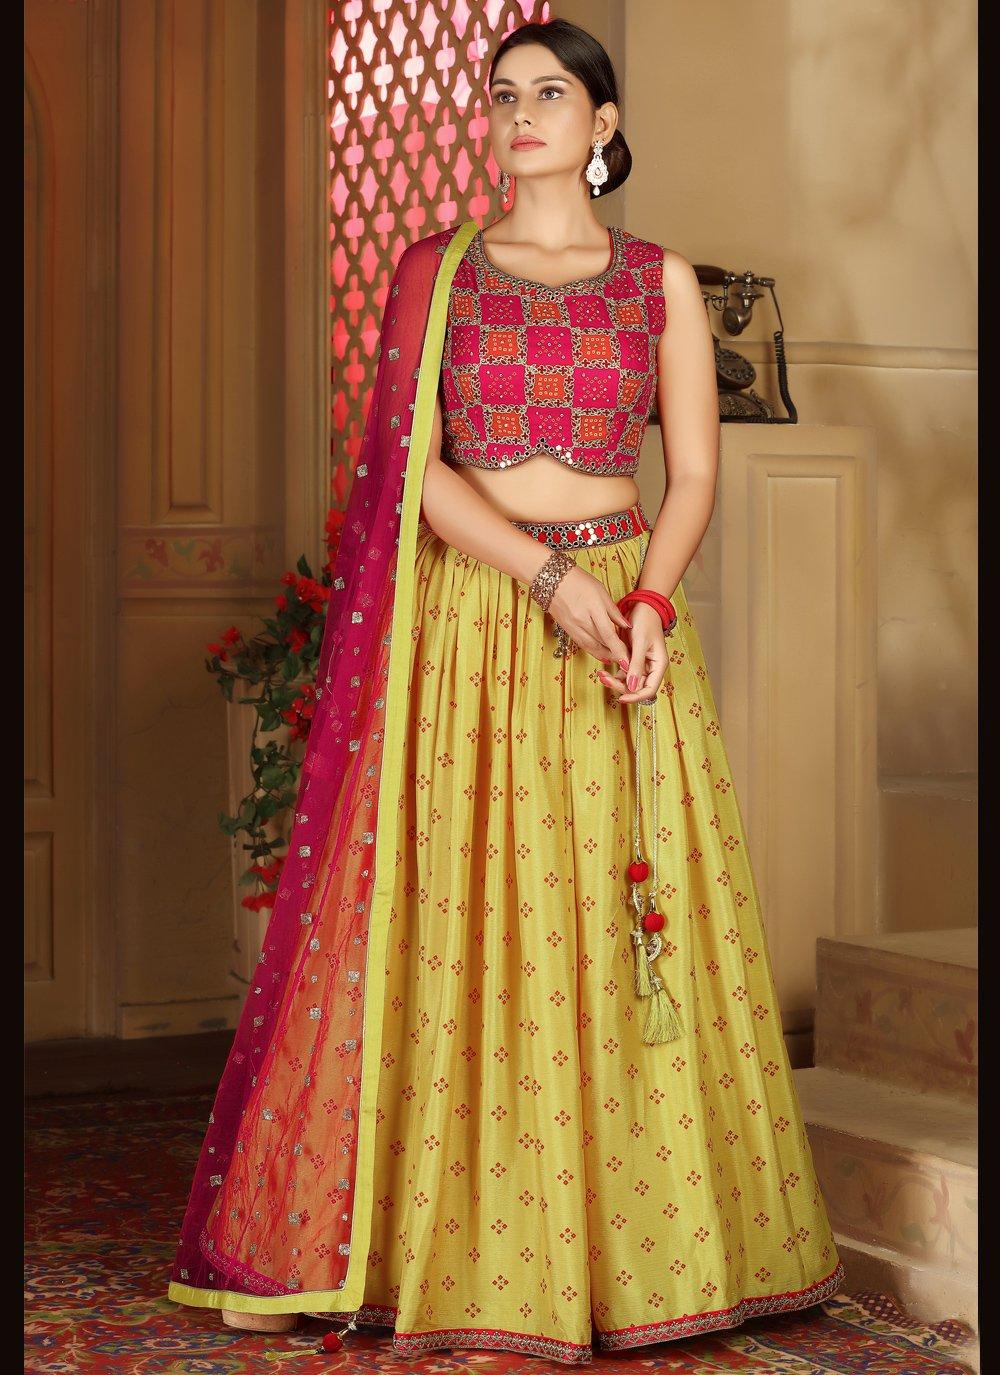 Pink and Yellow Fancy Sangeet Readymade Lehenga Choli